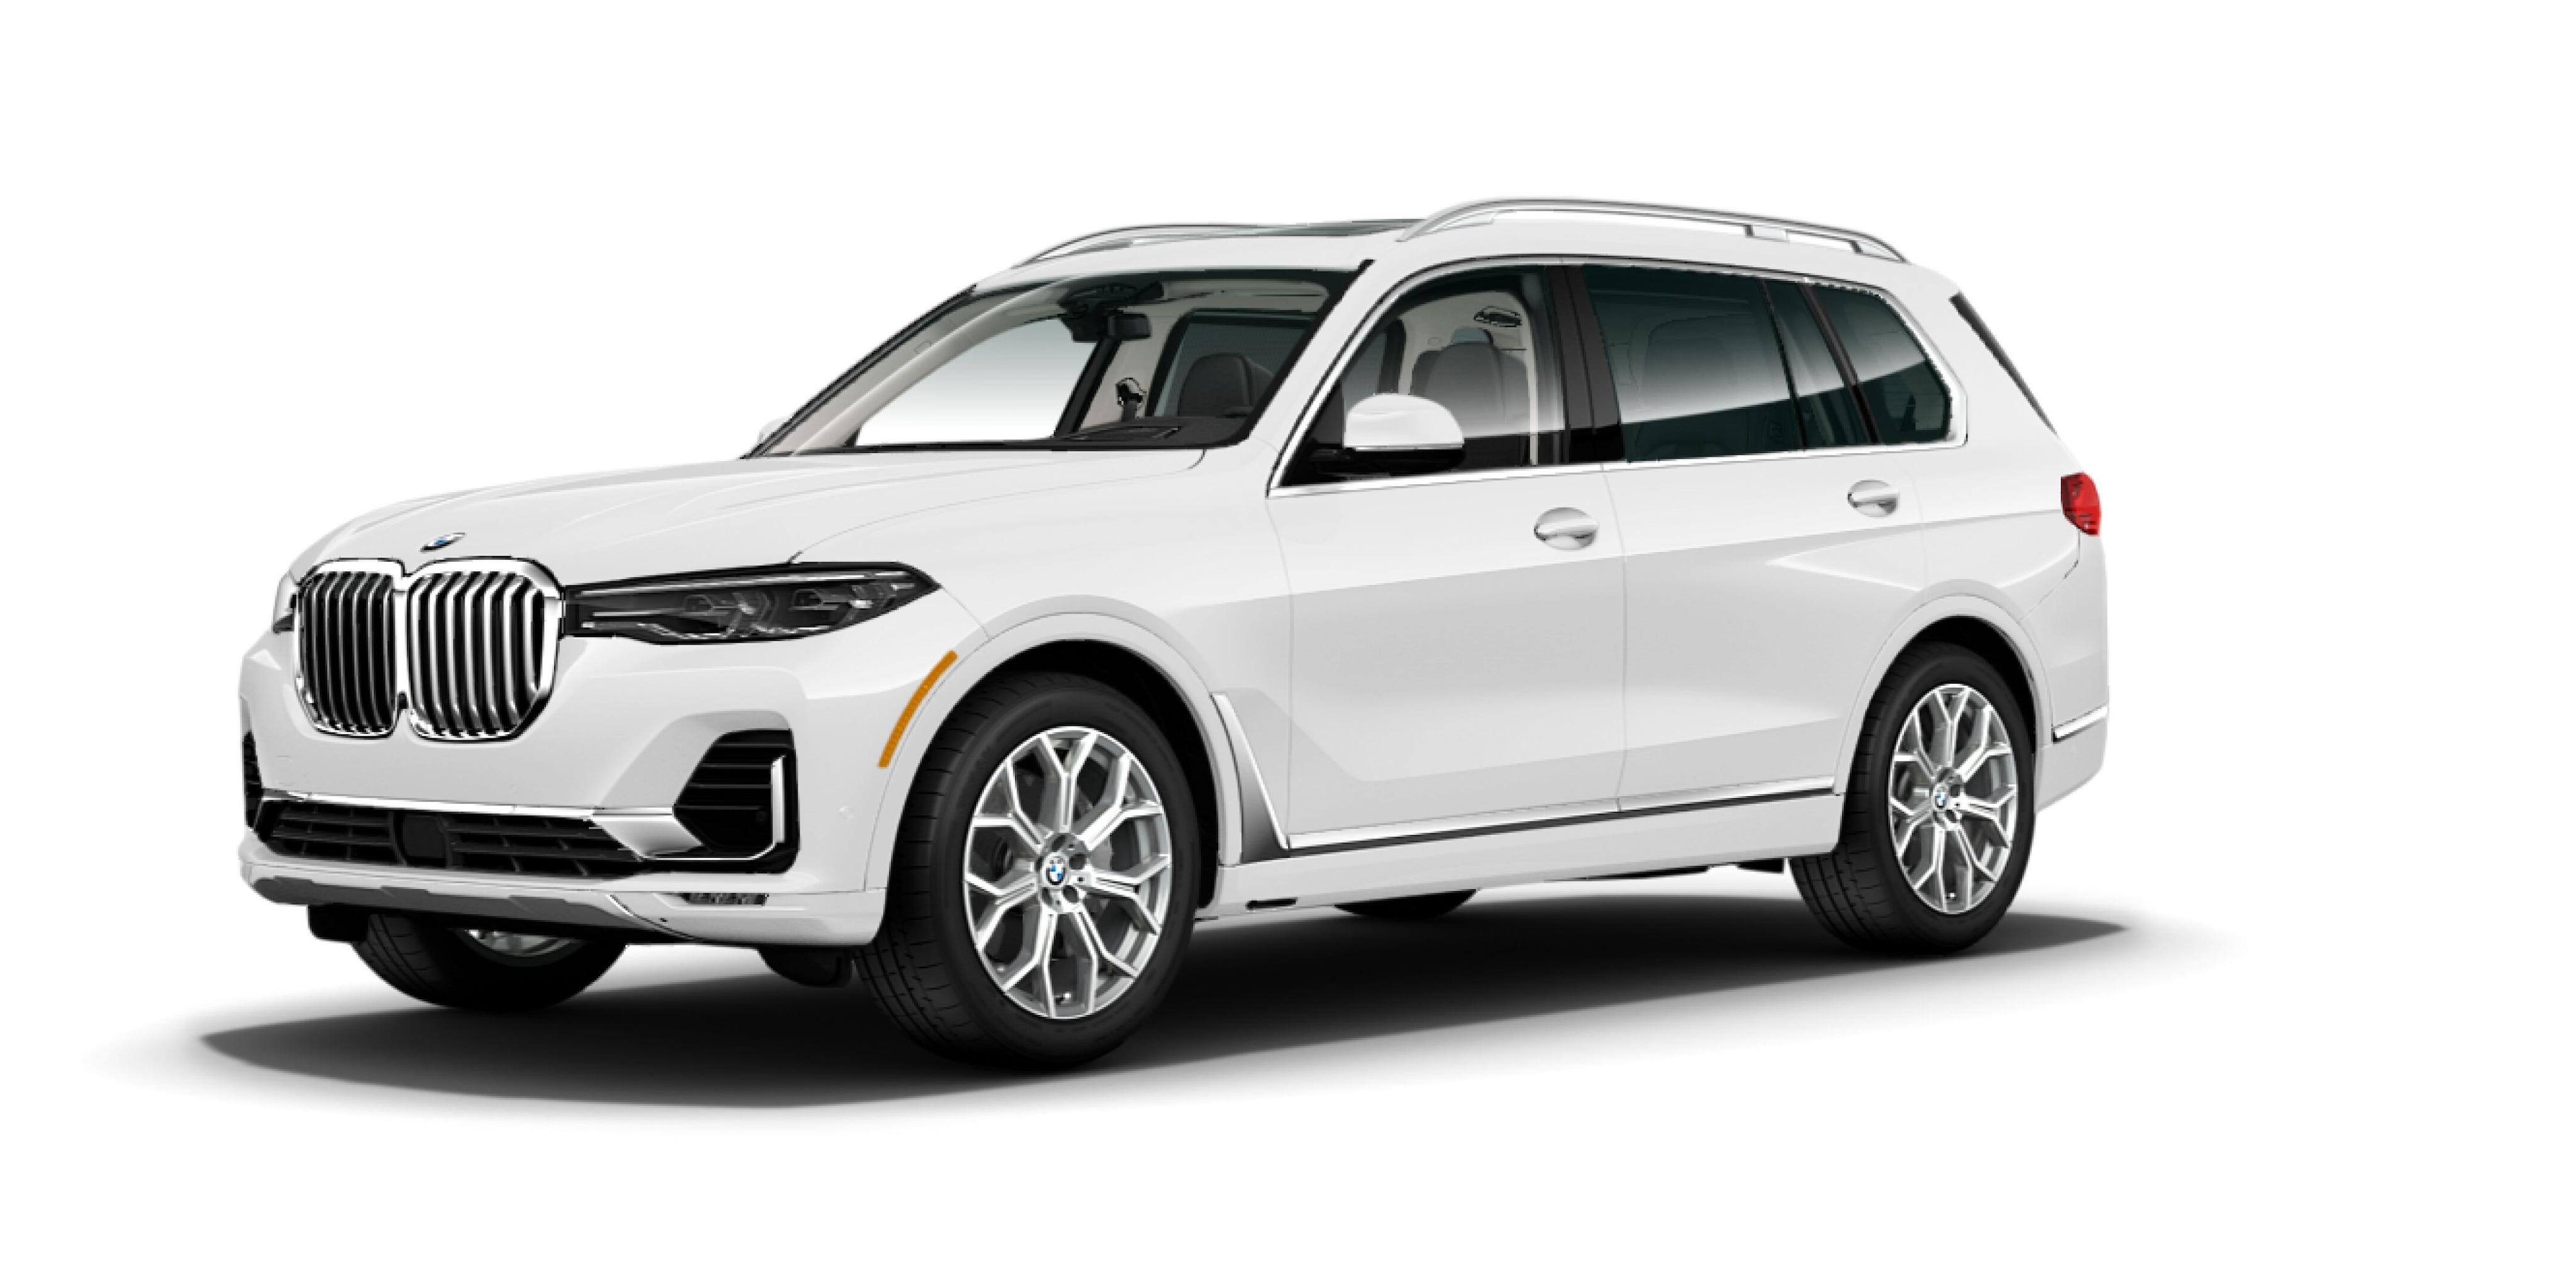 2019 BMW X7 xDrive50i SUV Hanover, NH